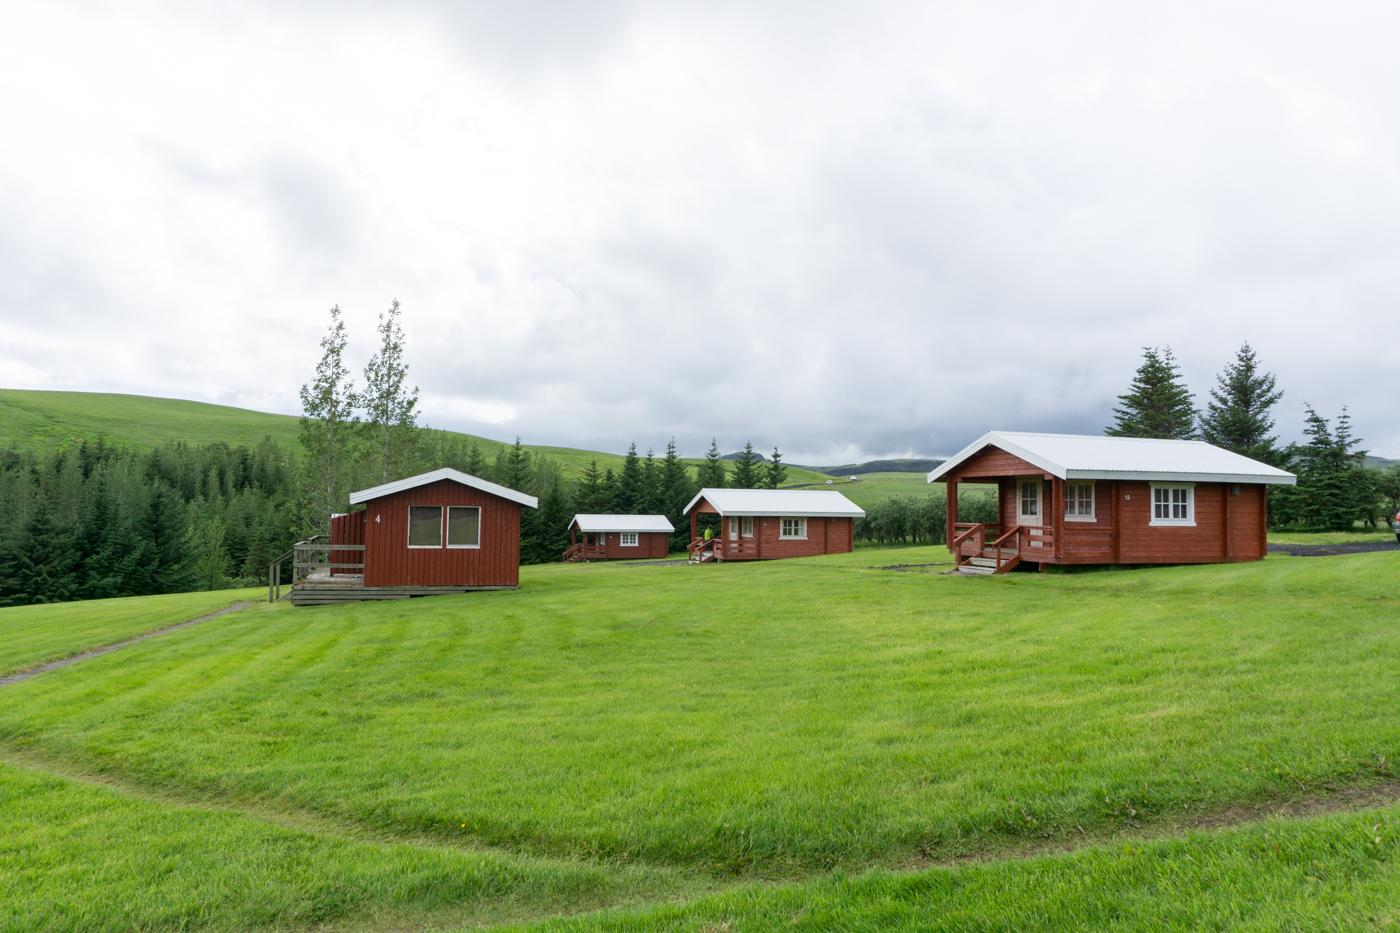 Hunkubakkar Guesthouse Farm-Restaurant, Kirkjubaejarklaustur au sud de l'Islande